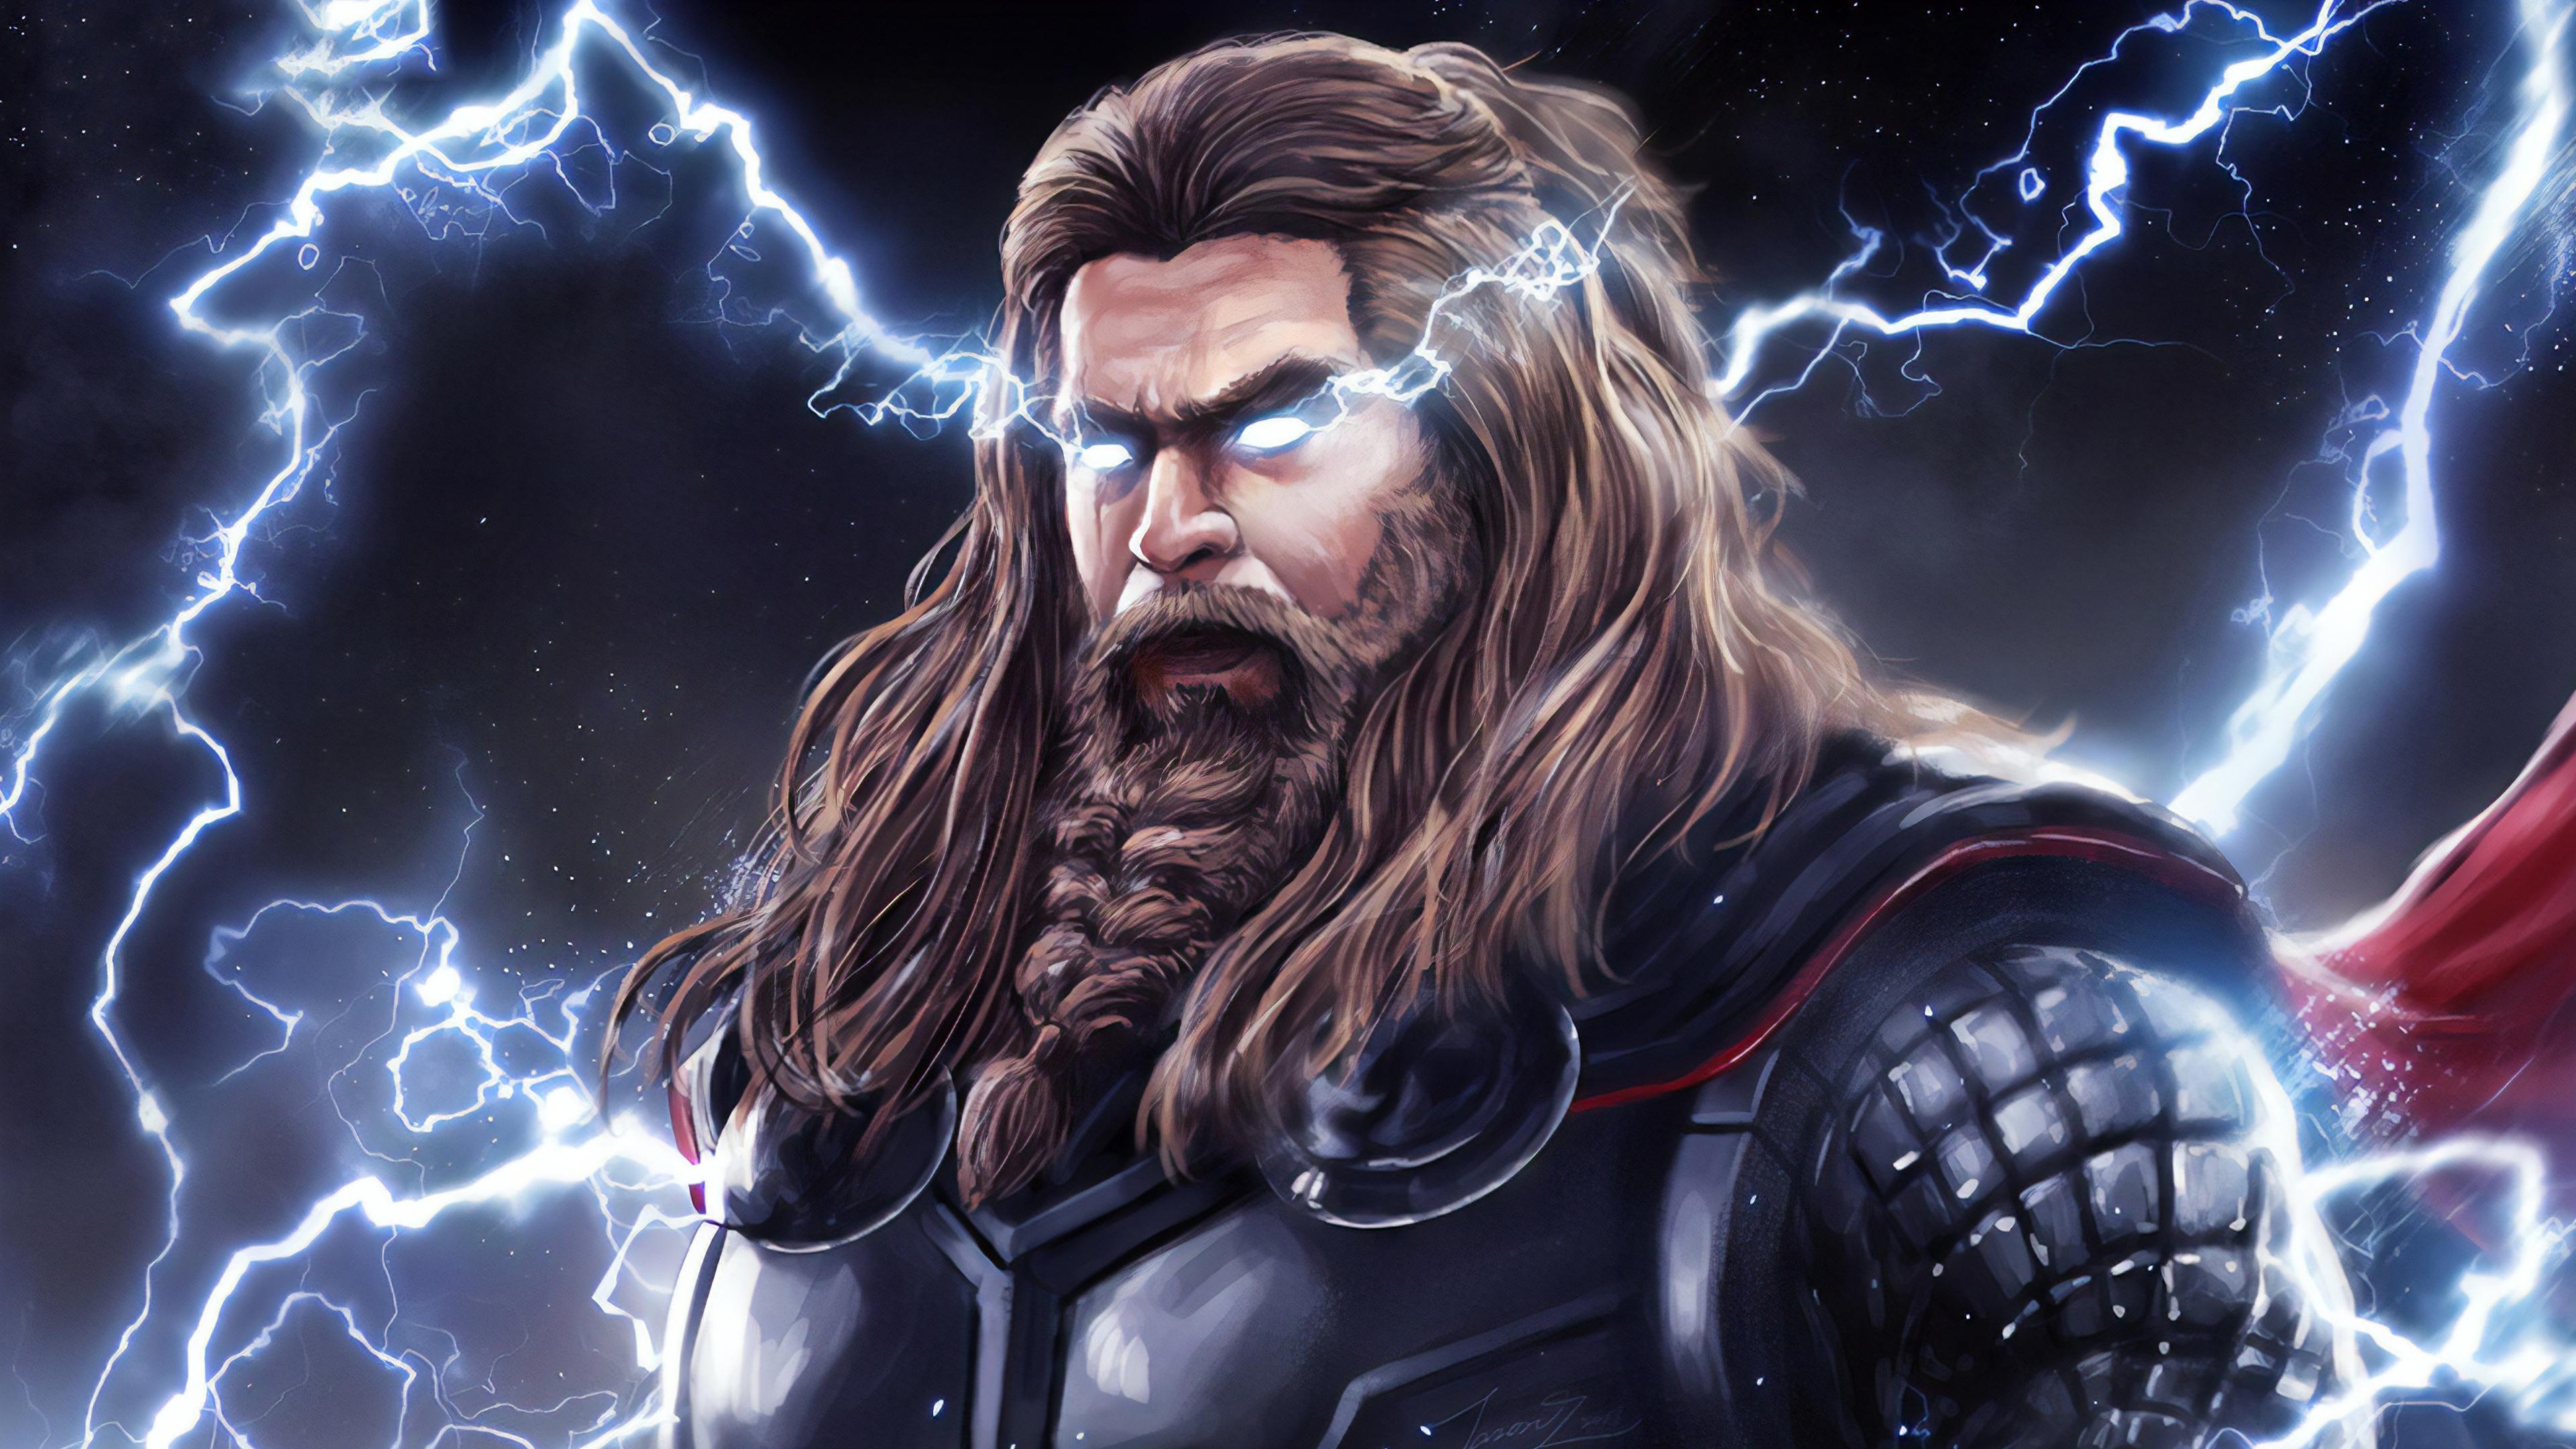 thor thunder lighting 1562105883 - Thor Thunder Lighting - thor wallpapers, superheroes wallpapers, hd-wallpapers, digital art wallpapers, avengers endgame wallpapers, artwork wallpapers, 4k-wallpapers